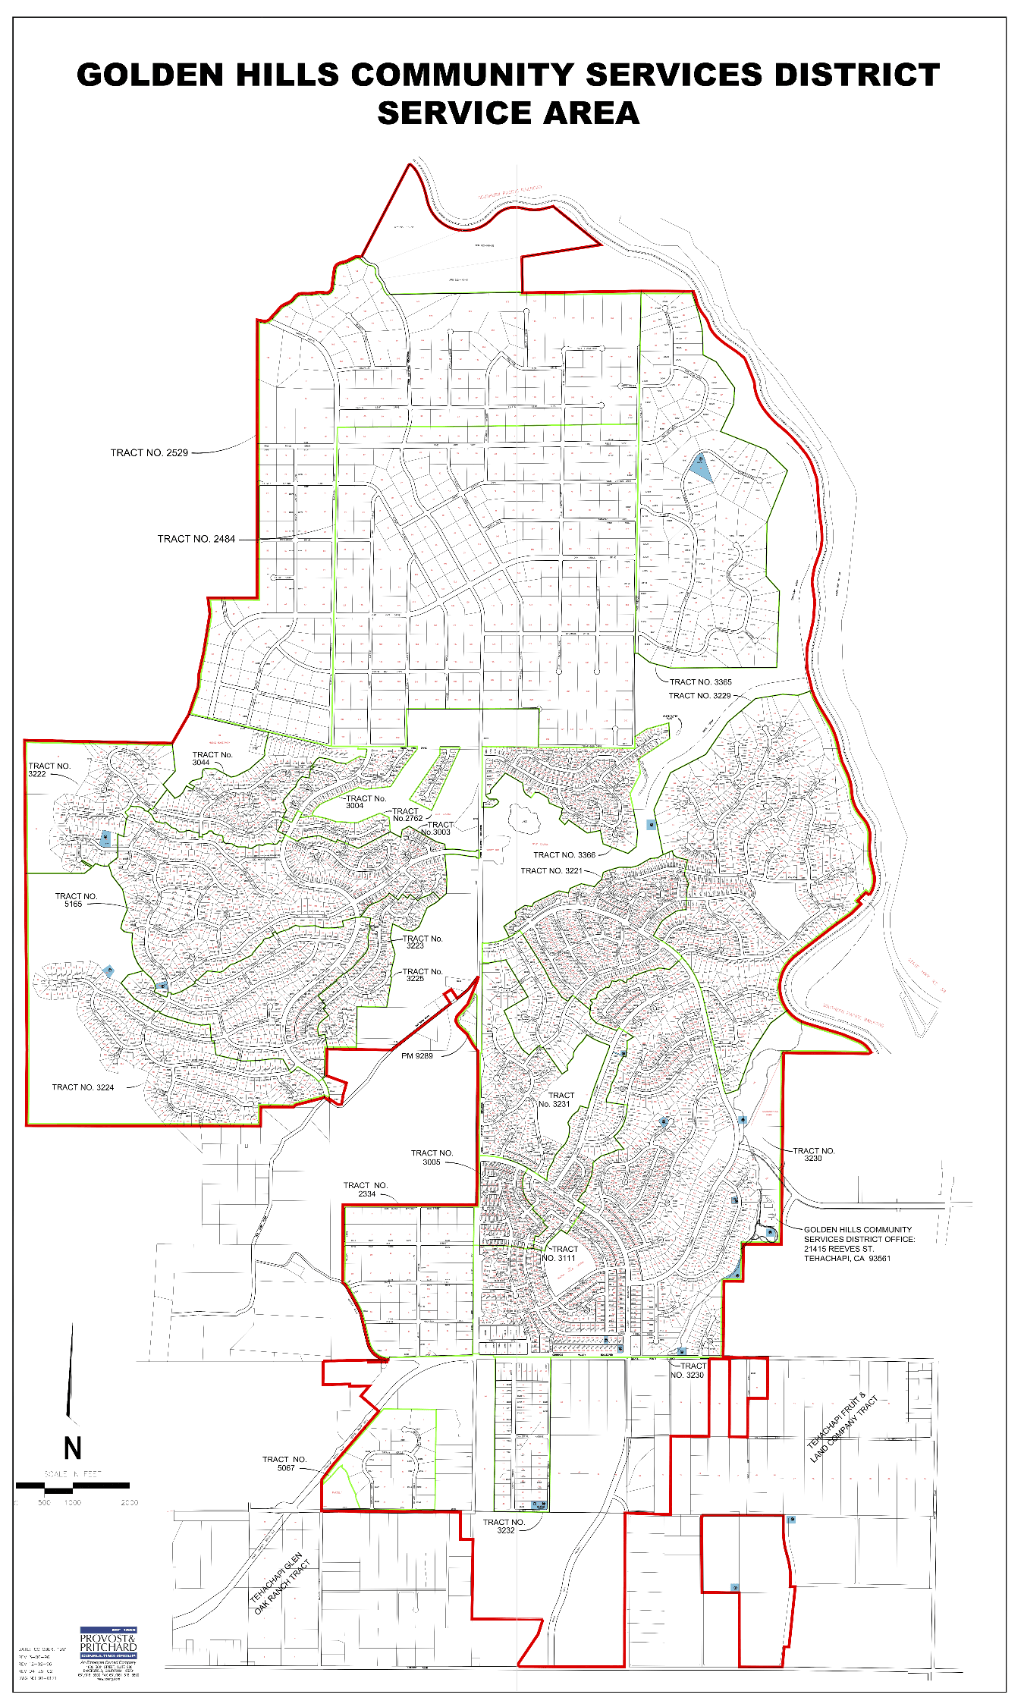 GHCSD Service Area Map1